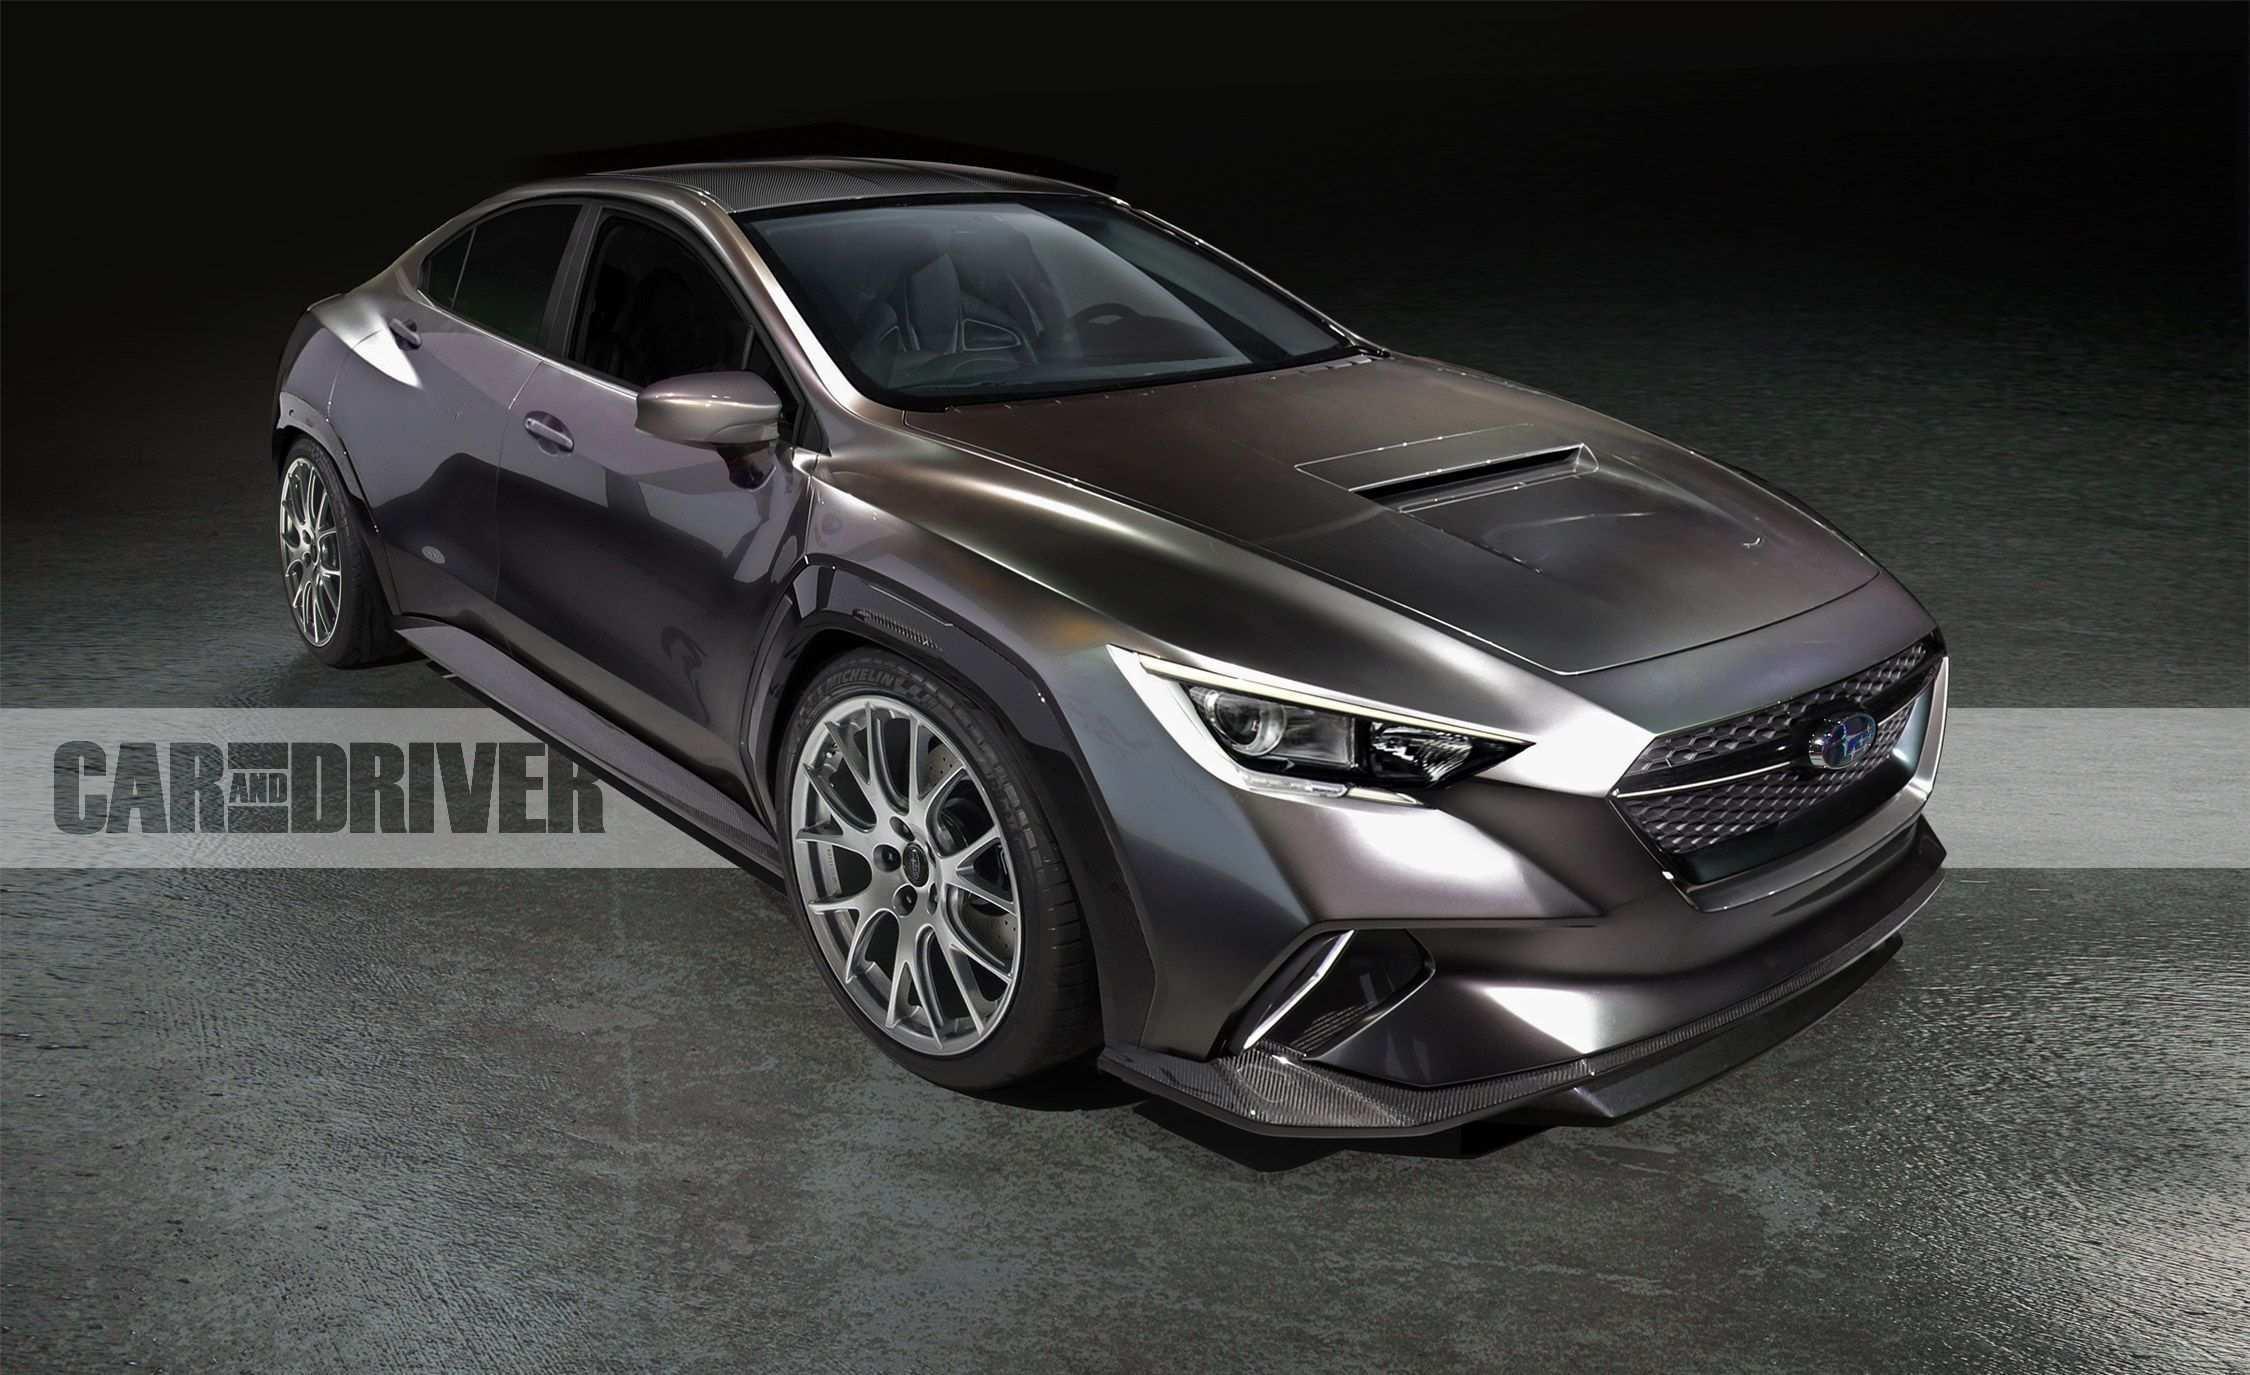 65 All New Subaru 2020 Wrx Performance with Subaru 2020 Wrx